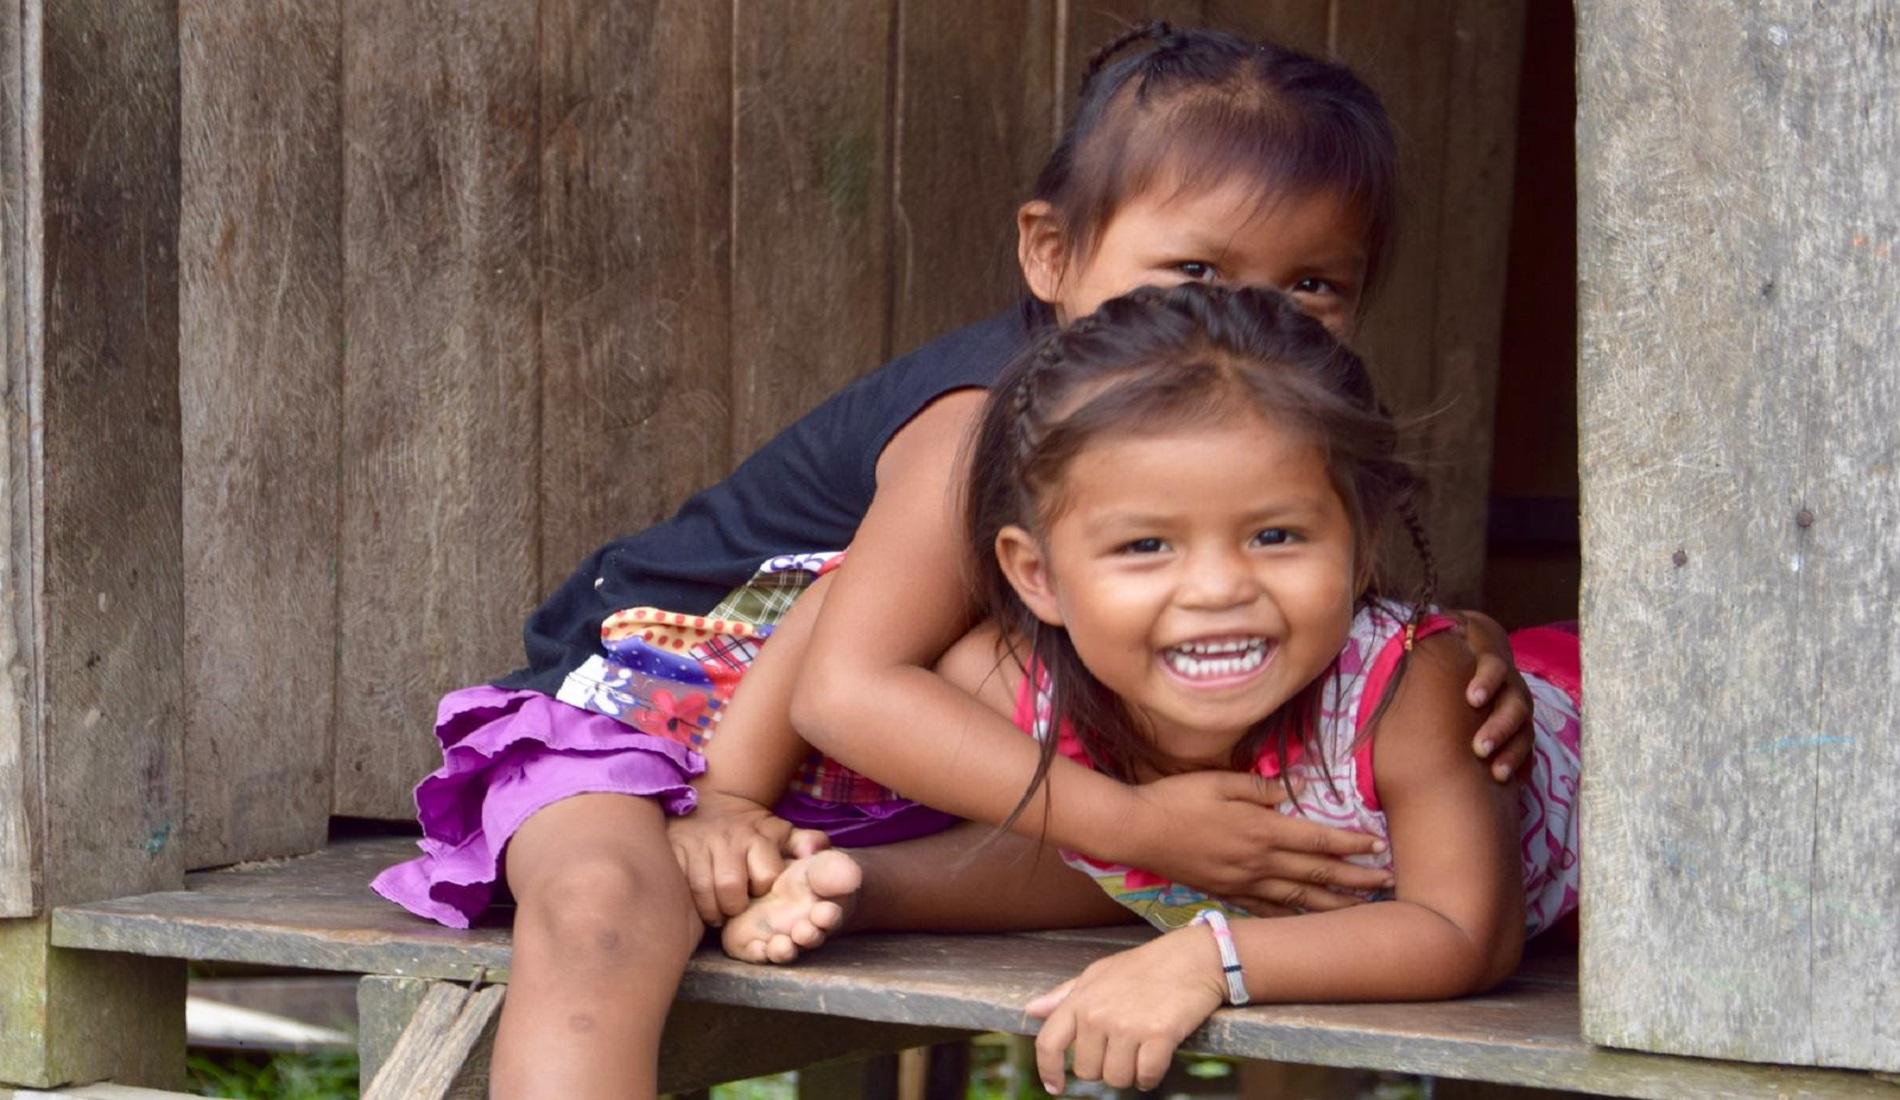 Amazone colombia locals